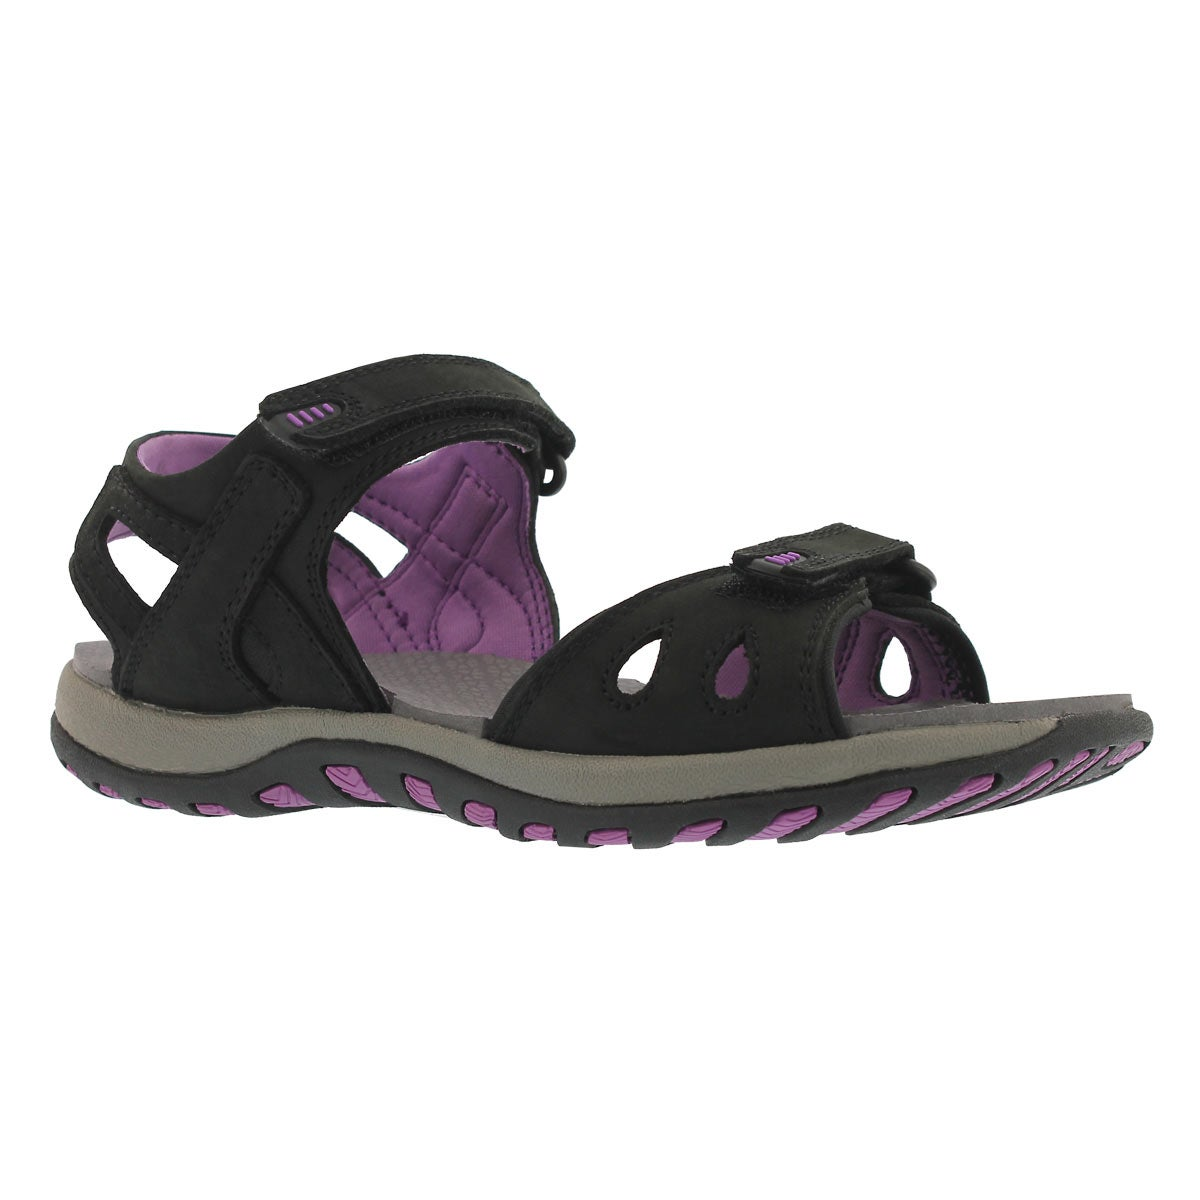 Women's CALEY 2 blk/lvndr 2 strap sport sandals